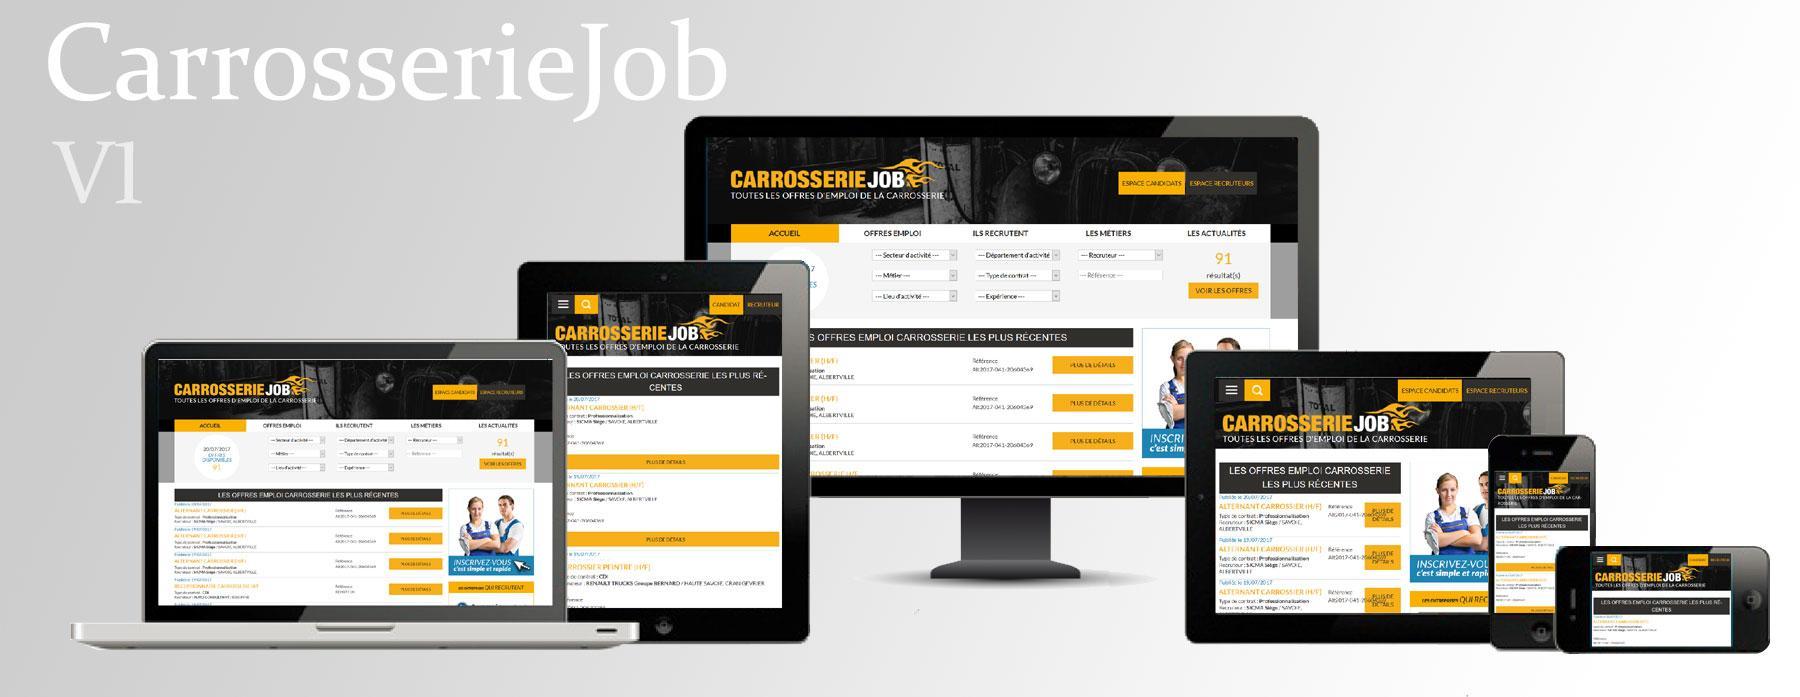 Carrosserie Job